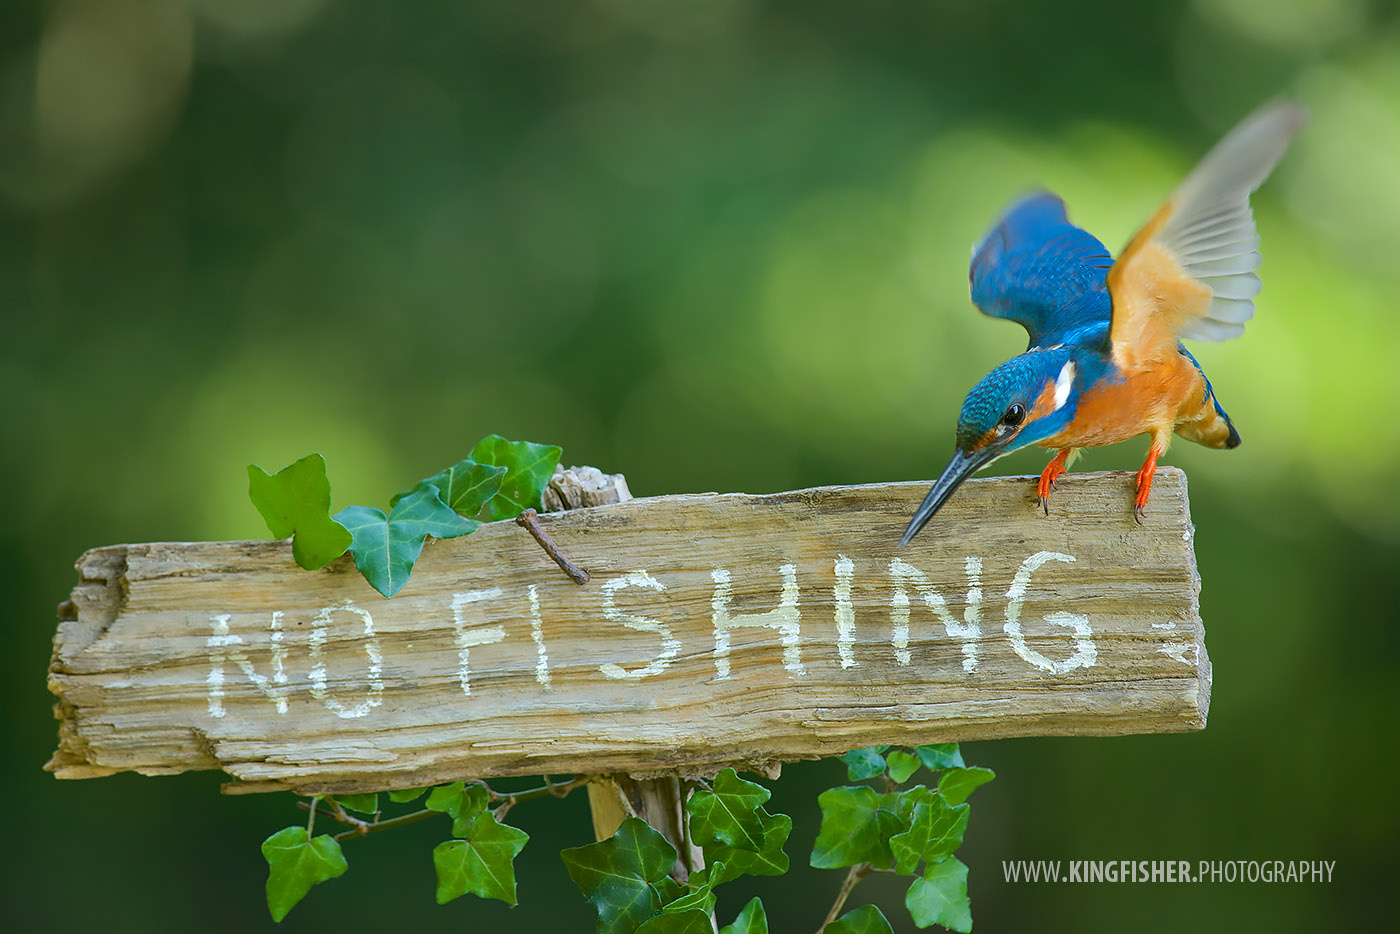 No fishing! by Corné van Oosterhout